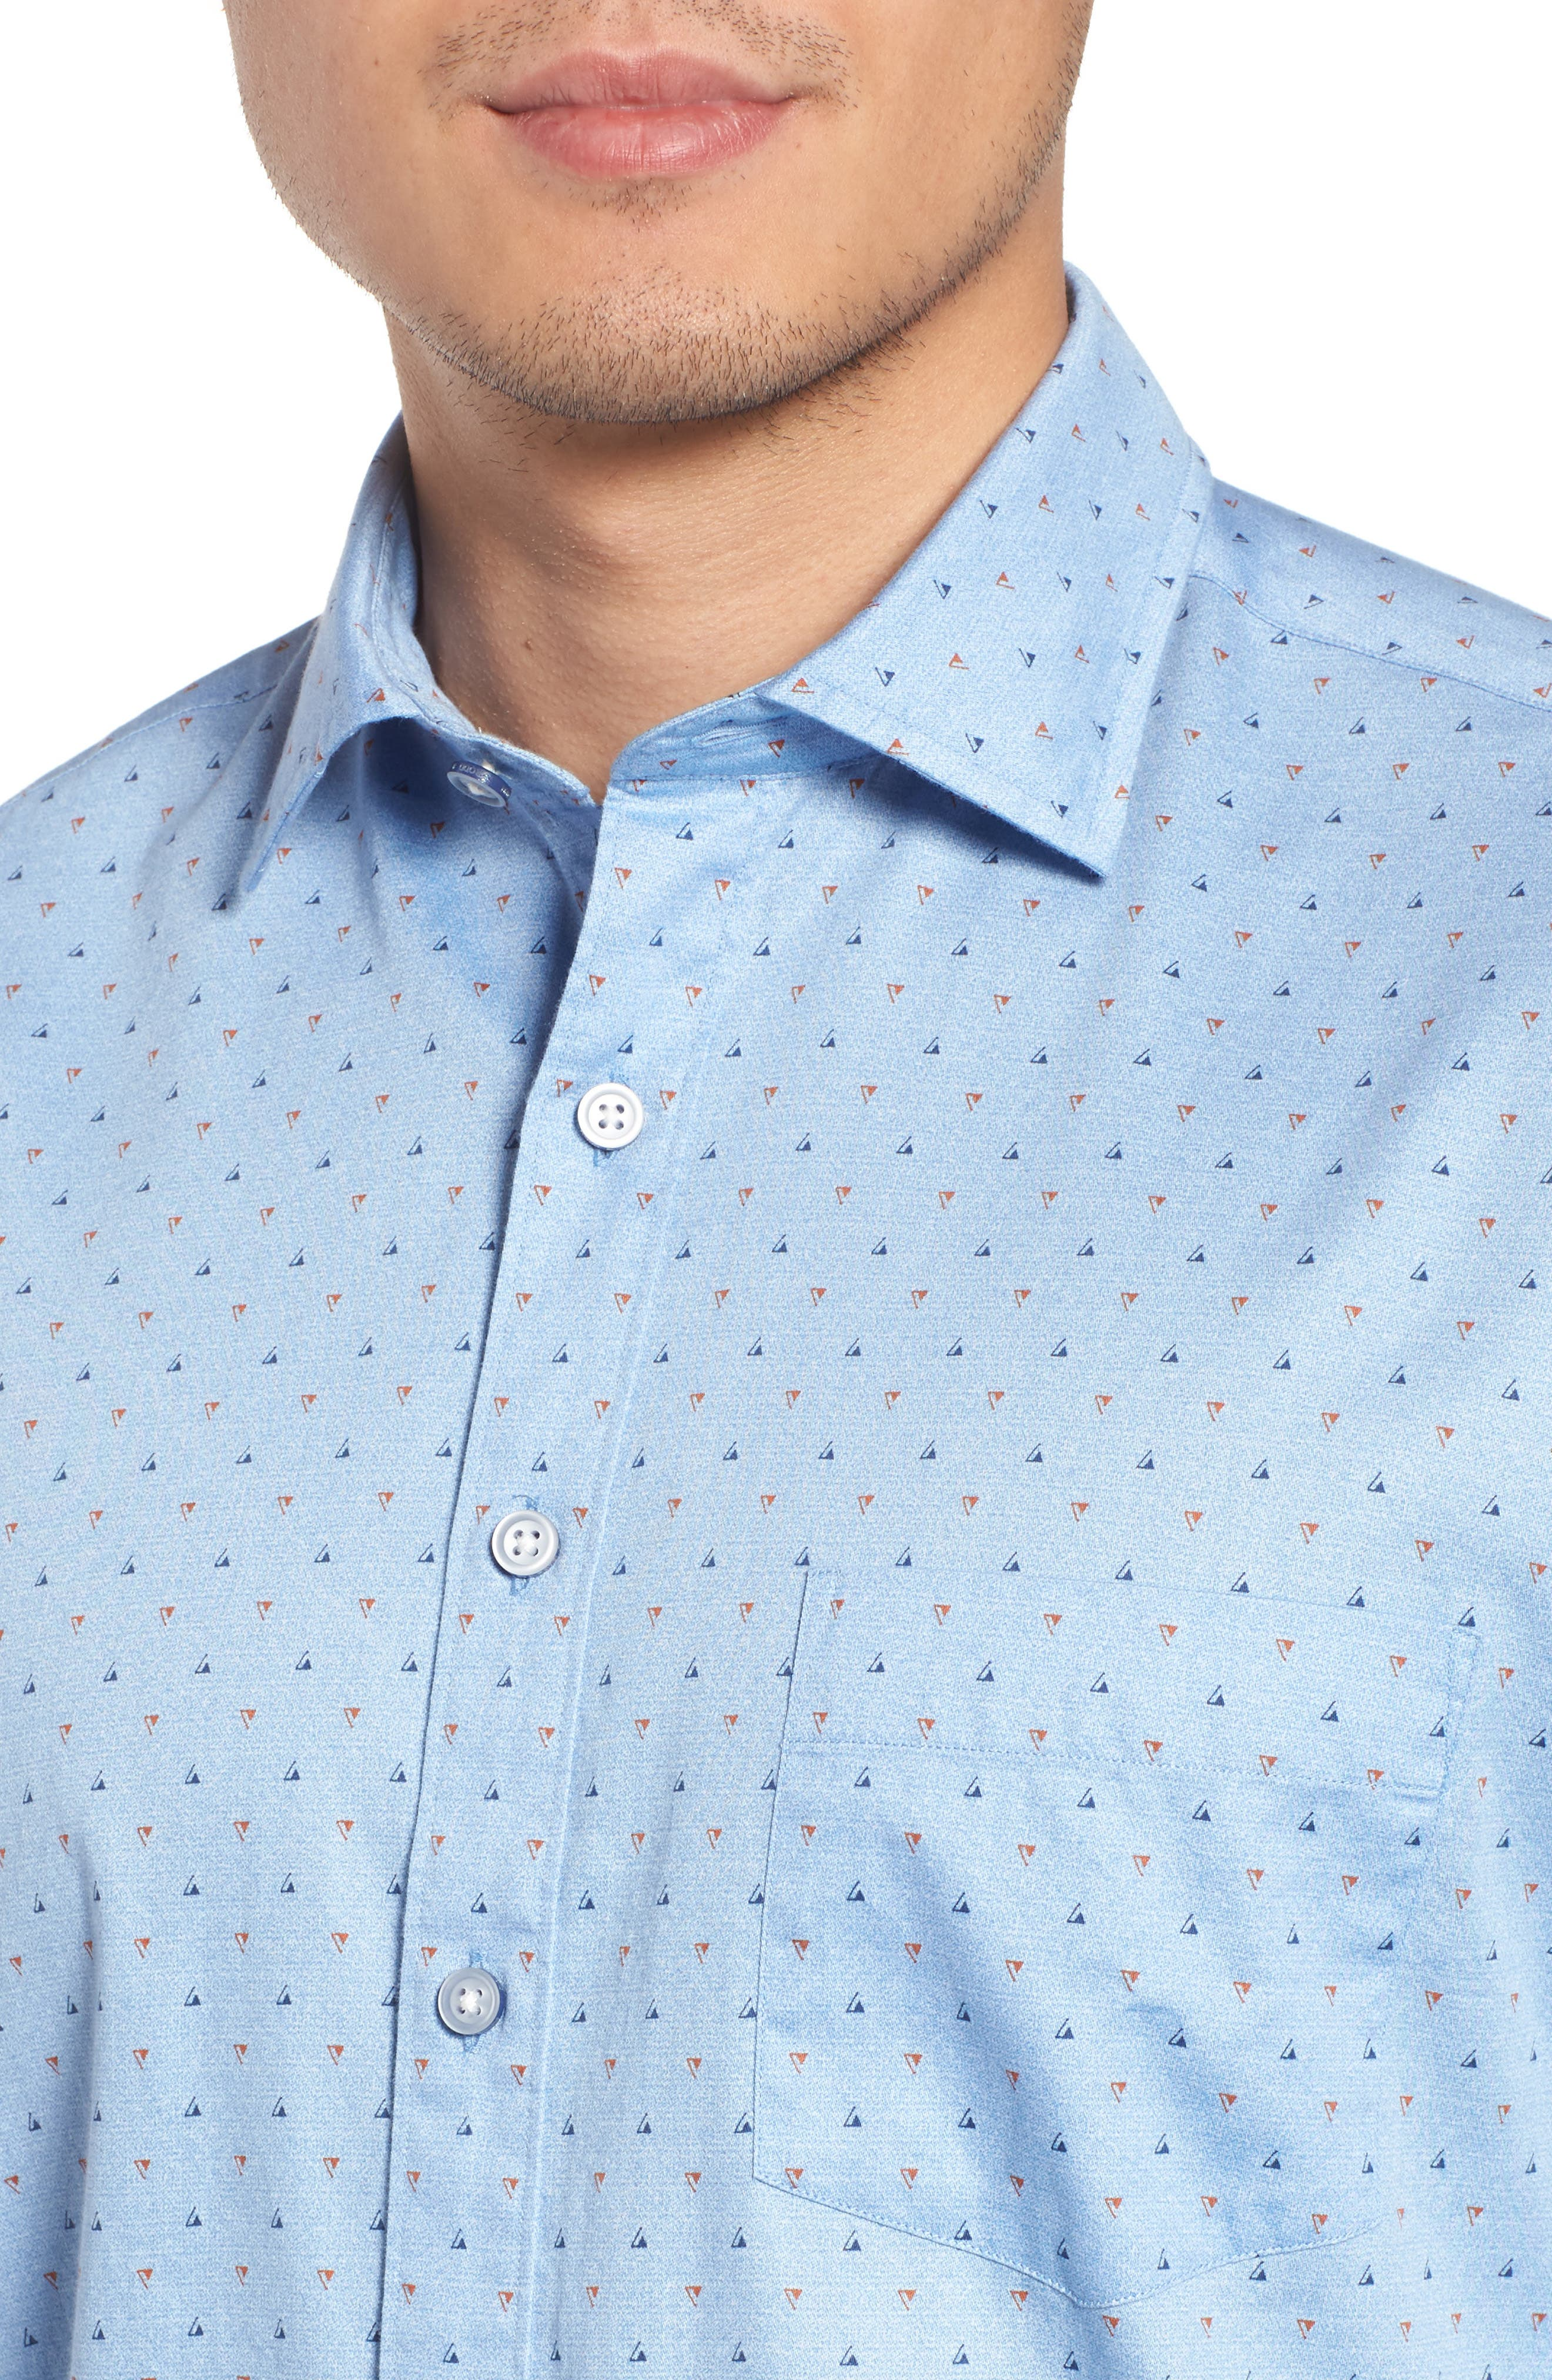 Penzance Regular Fit Sport Shirt,                             Alternate thumbnail 4, color,                             456